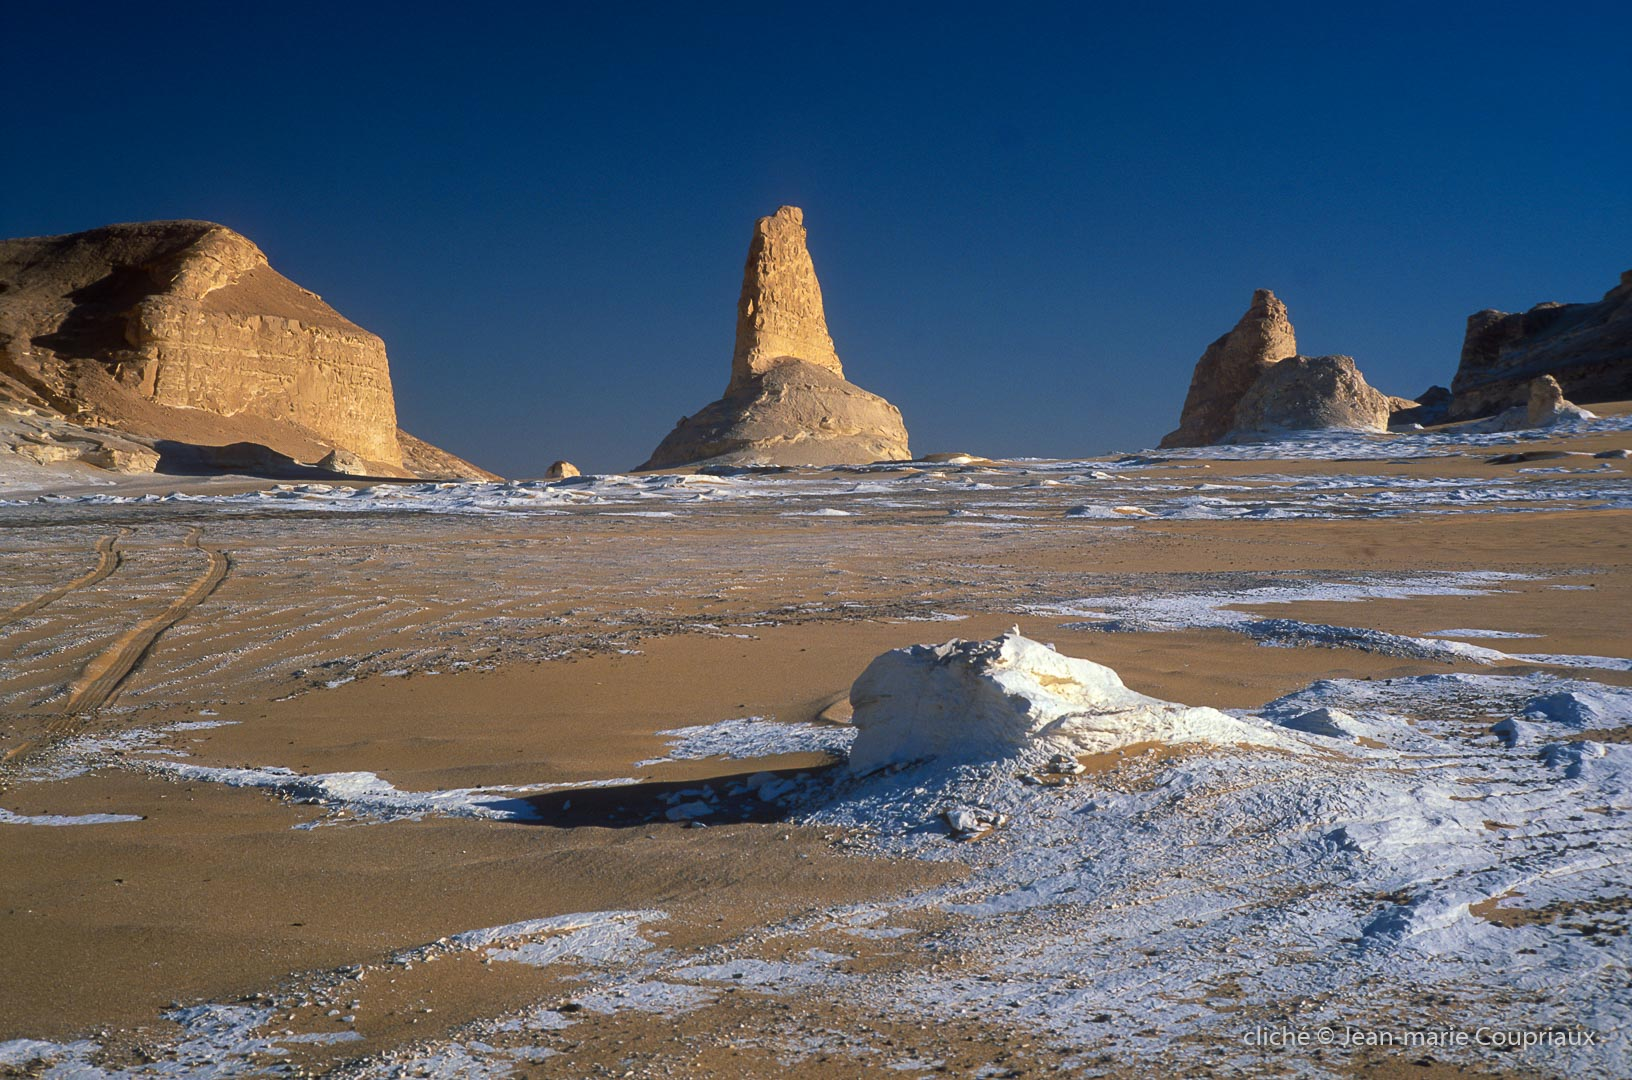 632-Egypte-2006